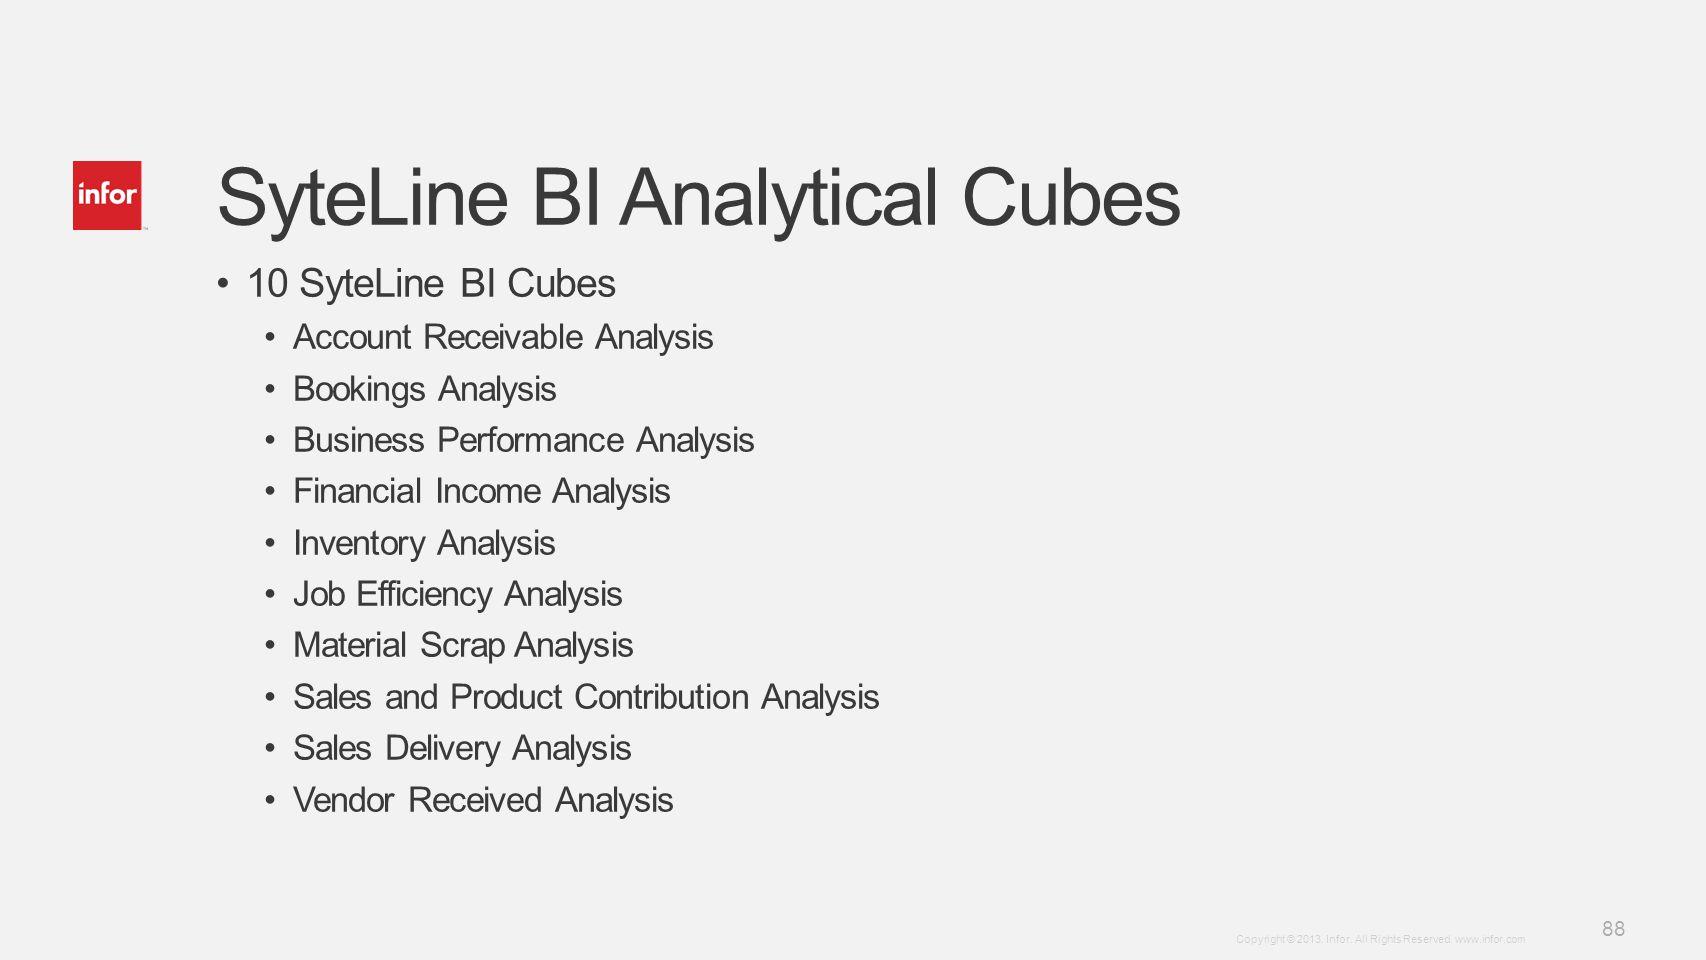 SyteLine BI Analytical Cubes